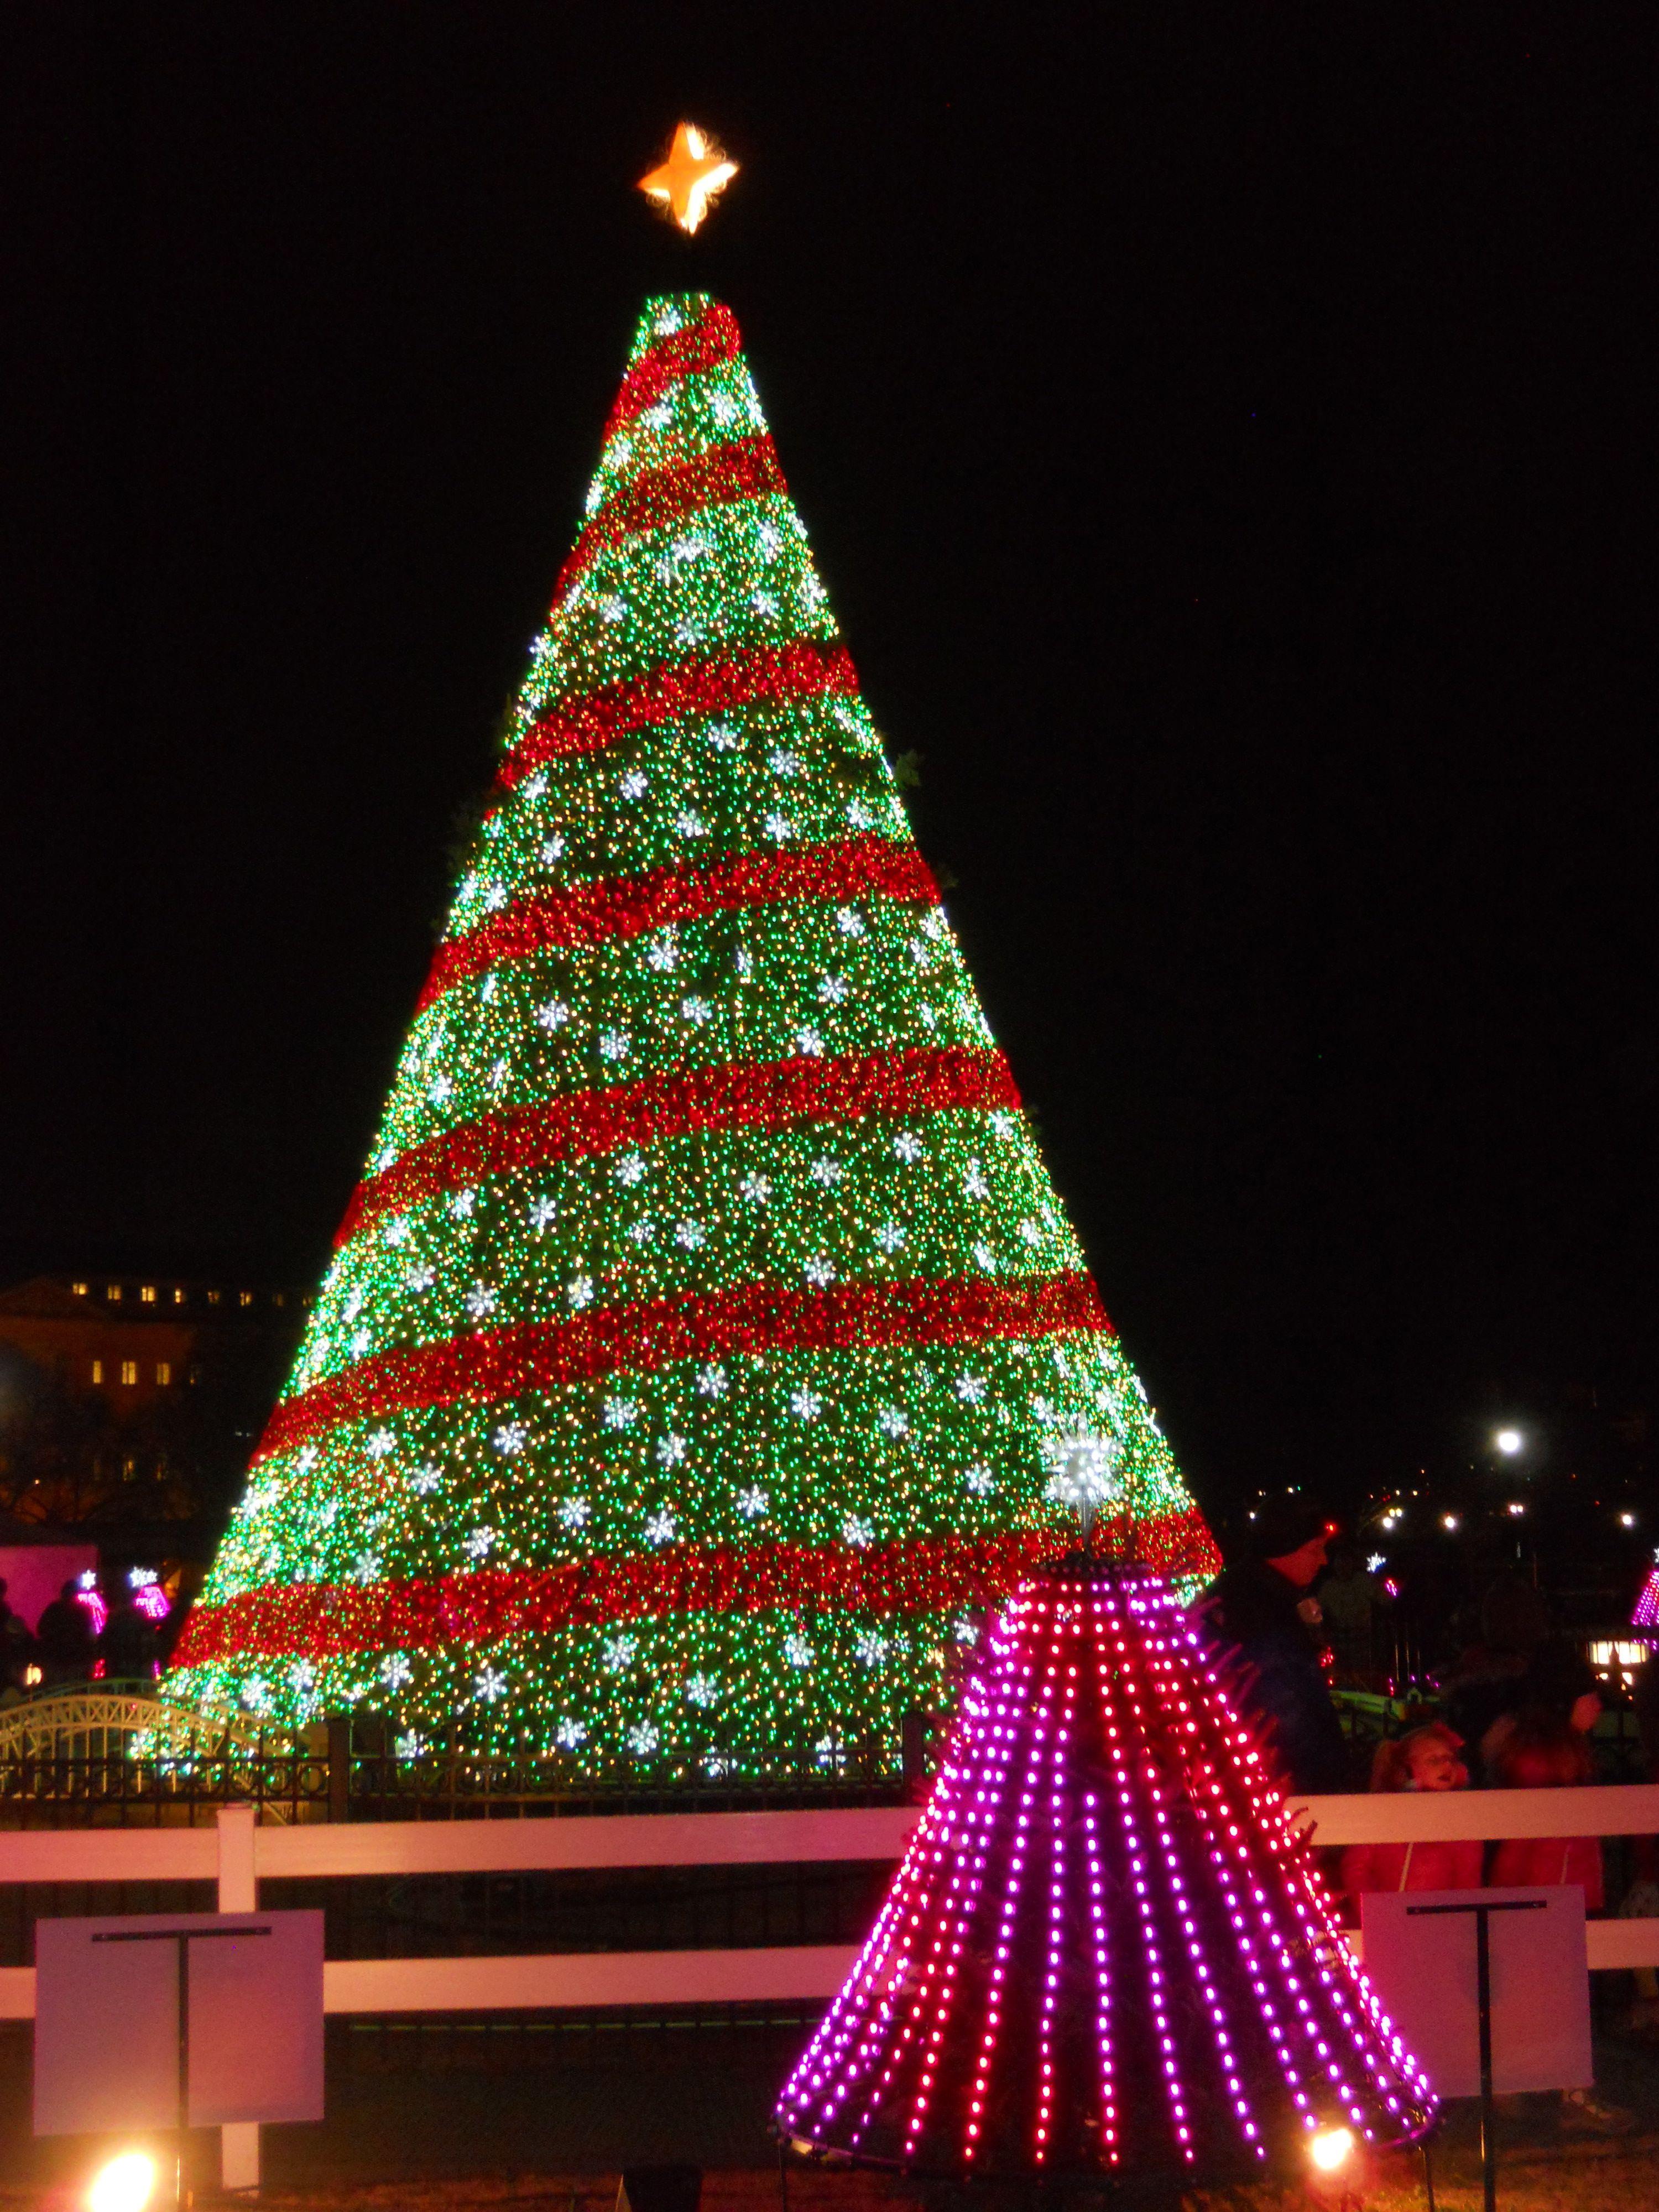 U.S. National Christmas Tree on December 29, 2014